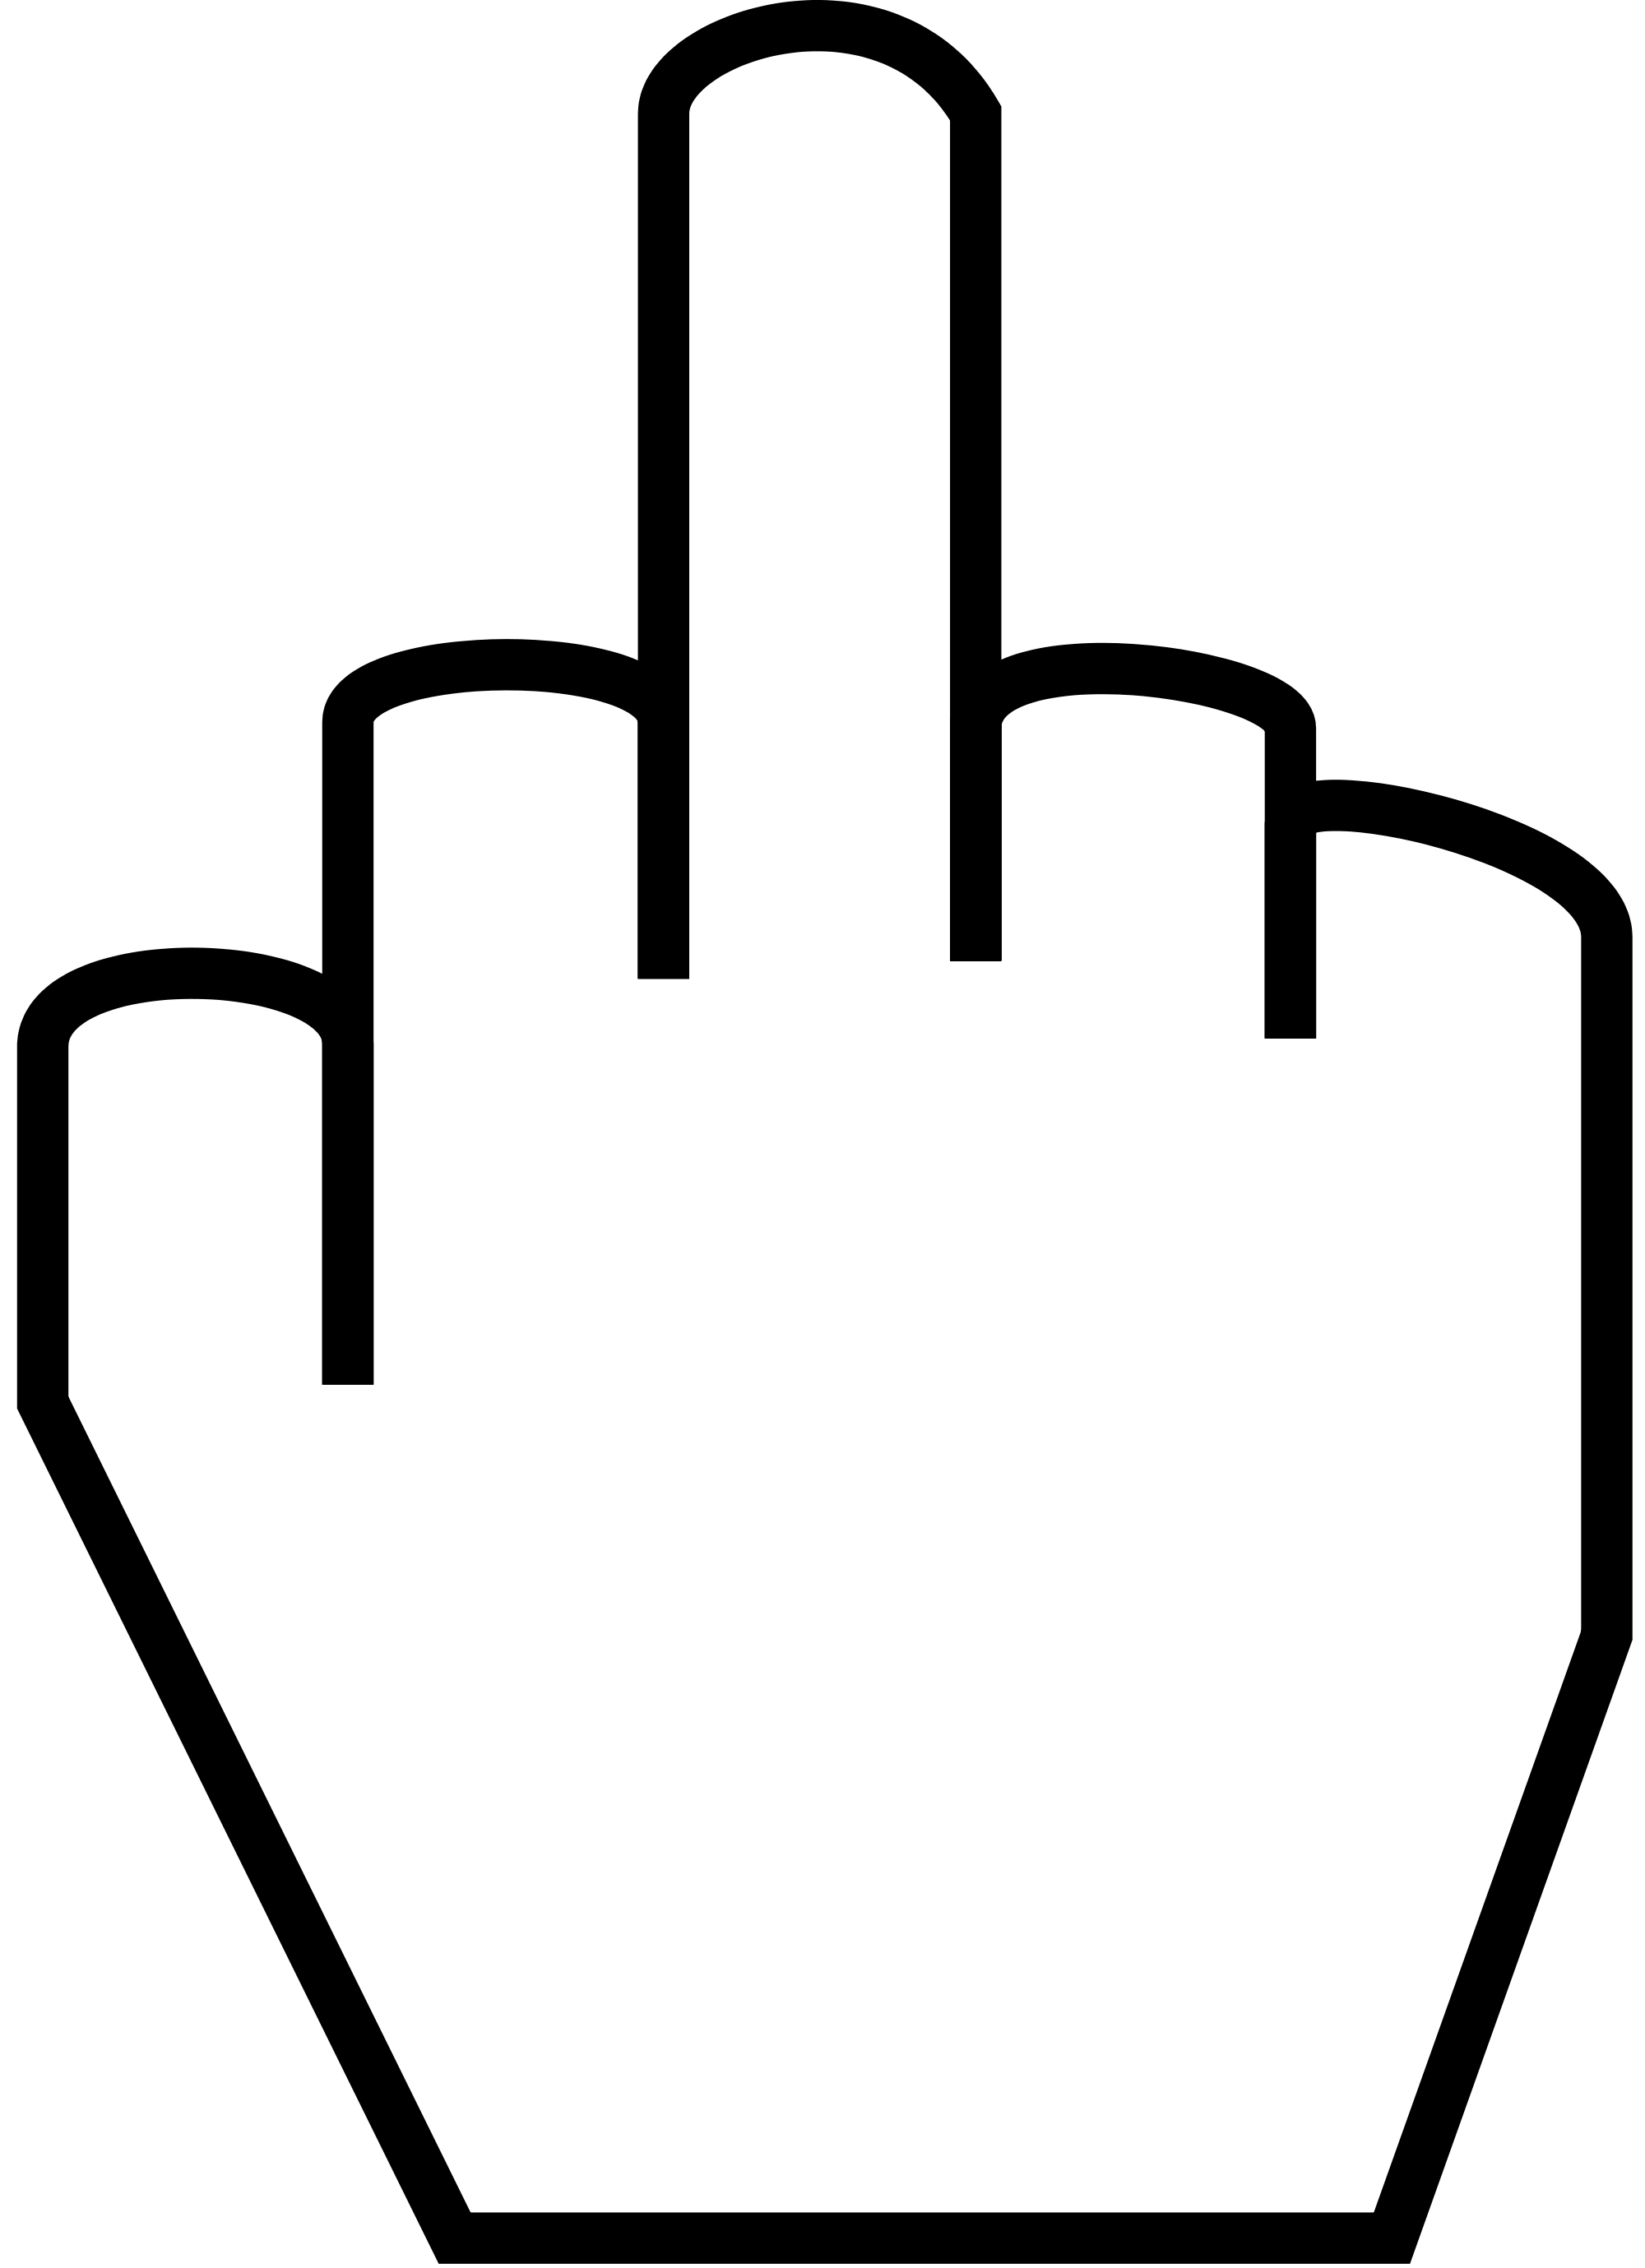 Finger svg #18, Download drawings